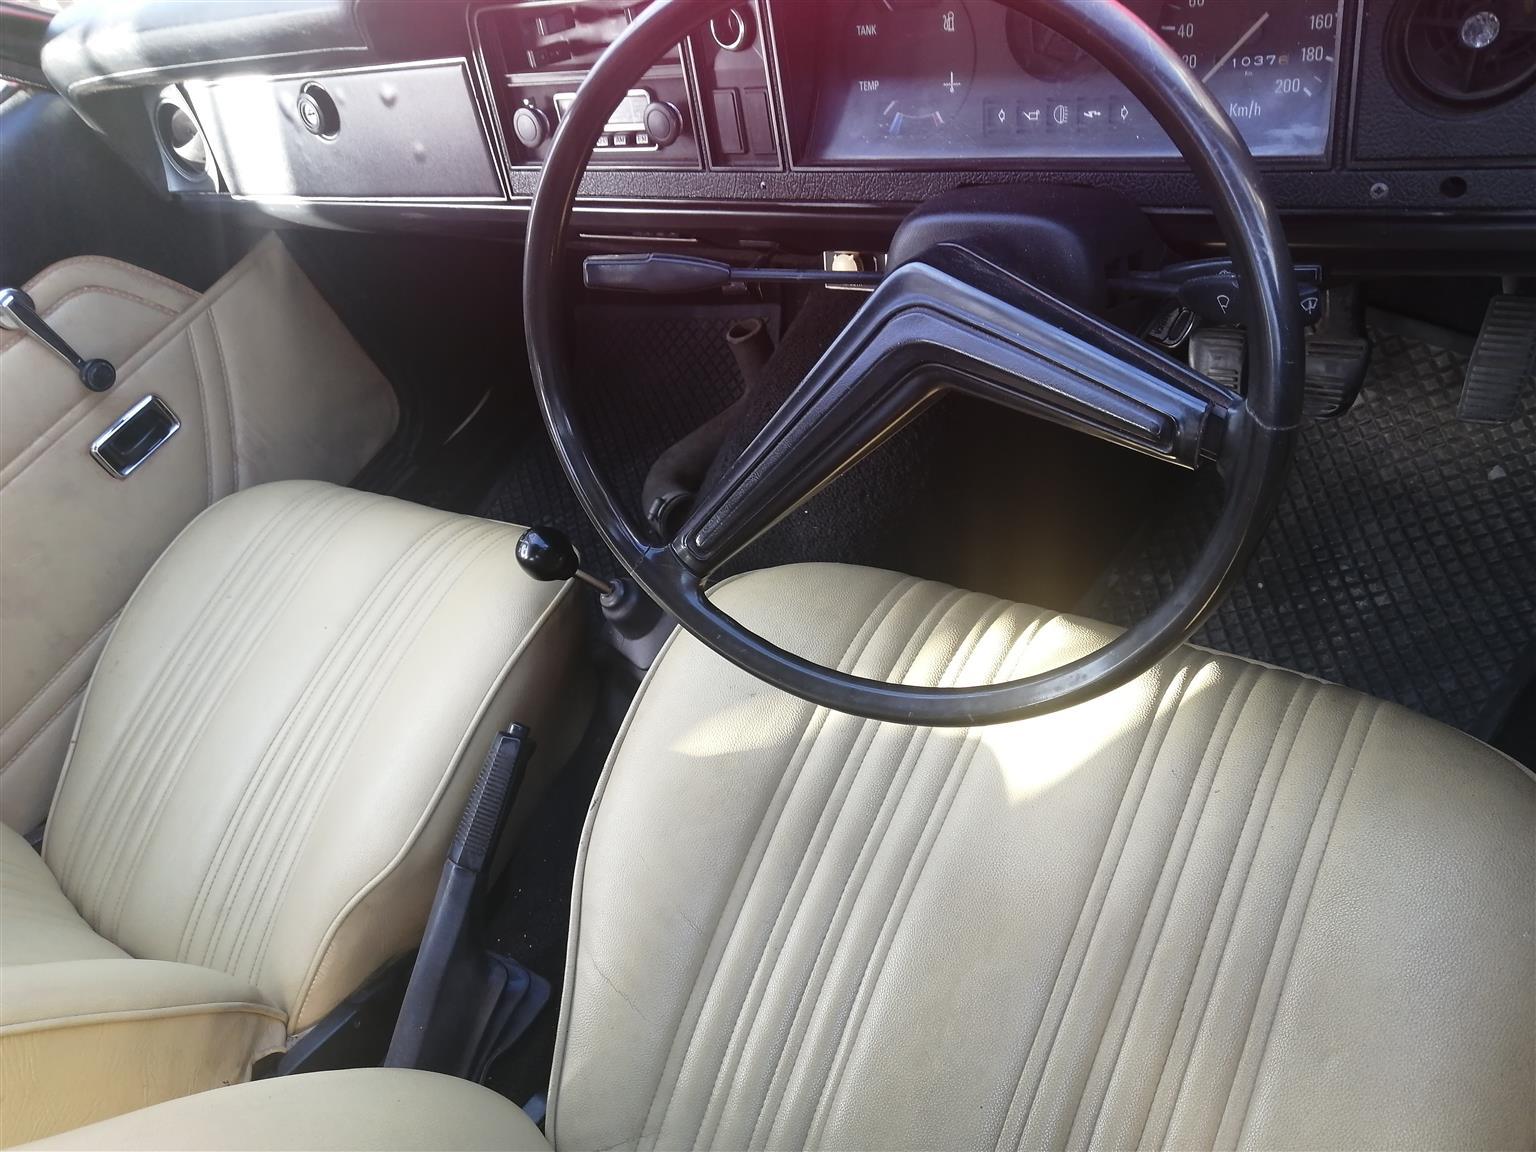 1976 Ford Cortina